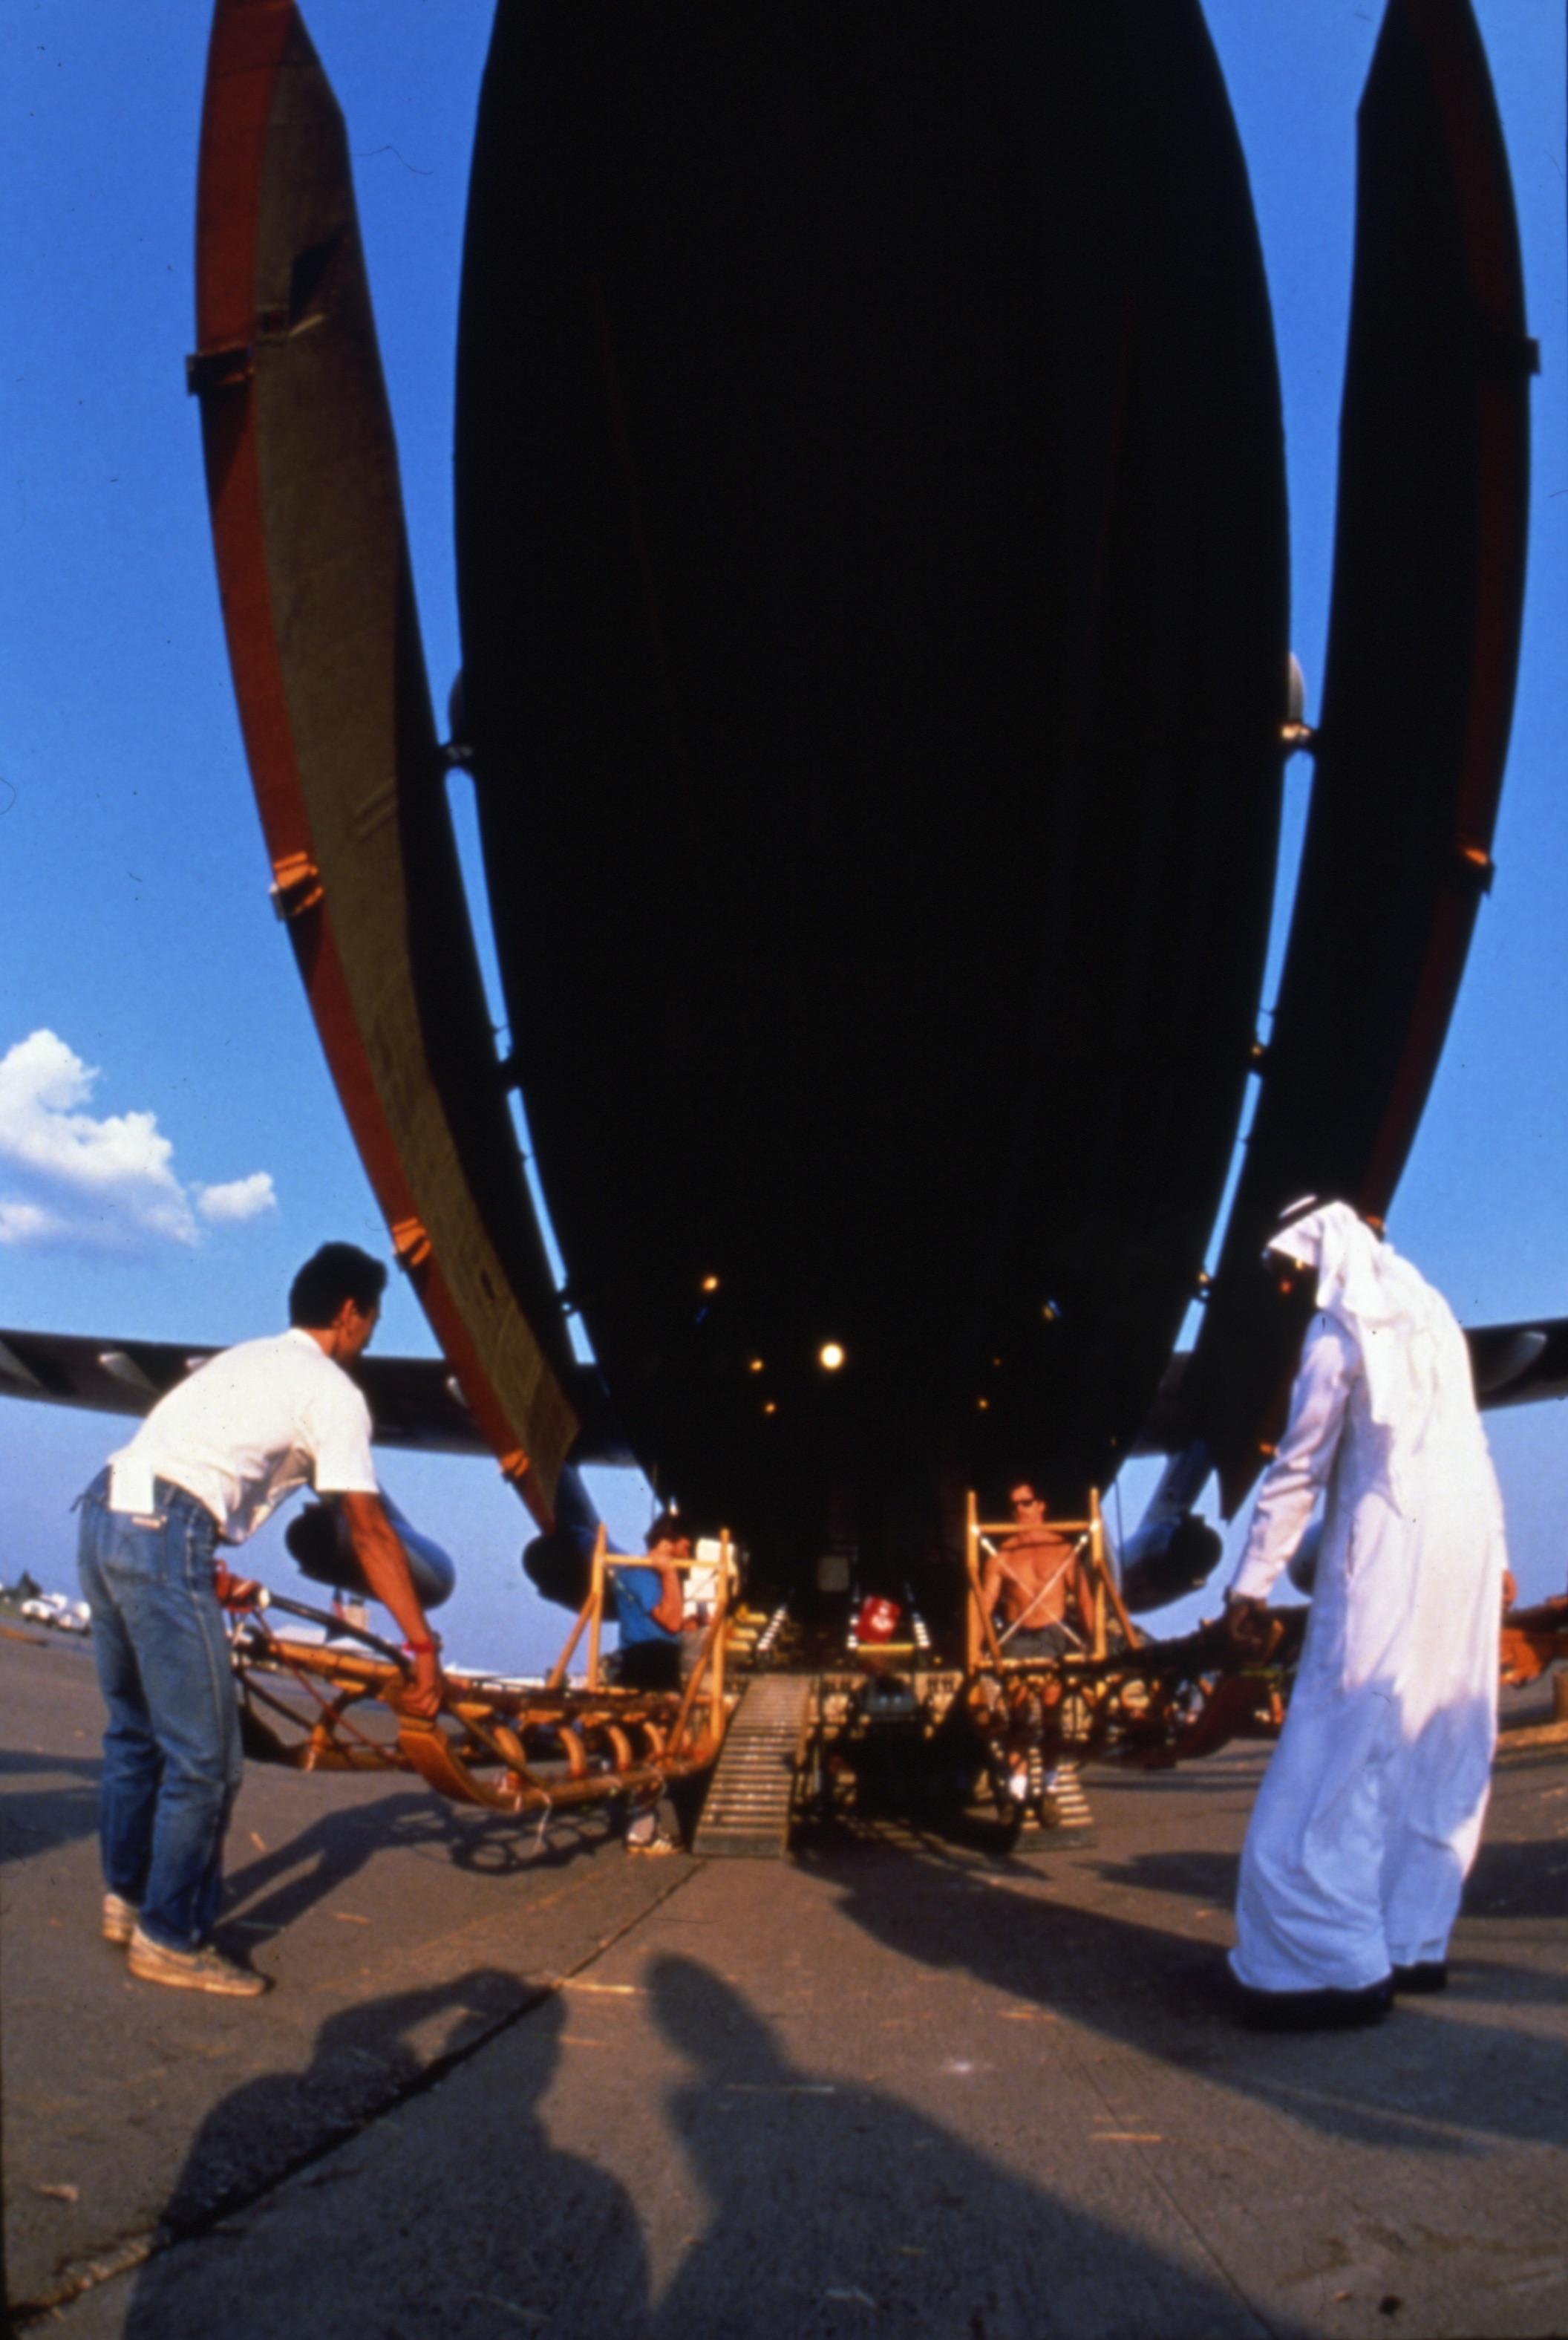 Trans-Antarctica sleds are loaded onto the Soviet's Illyushin 76 in Minneapolis, July 16, 1989. From left, Keizo Funatsu, John Stetson, Ibrahim Alam. Photo © Will Steger.